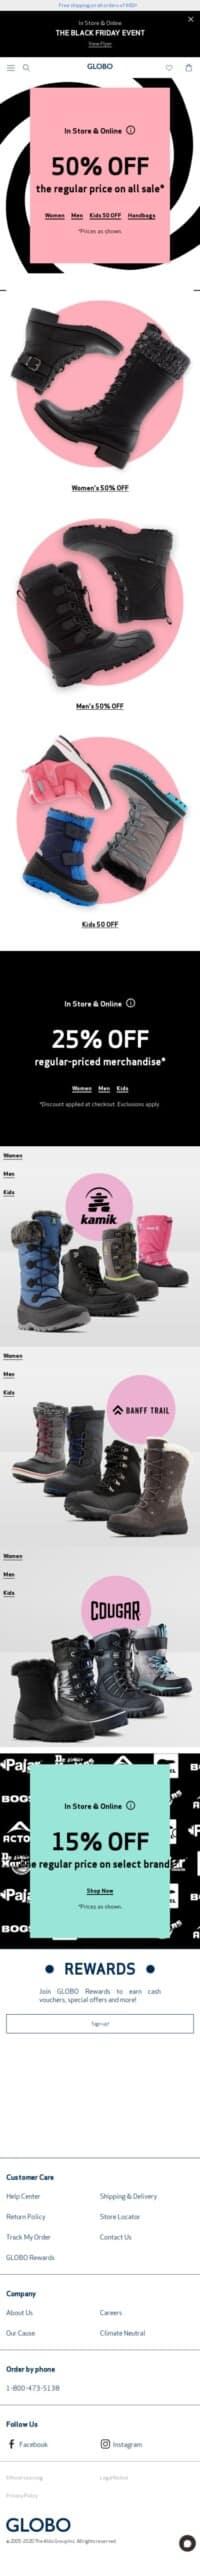 GLOBO Shoes Coupon